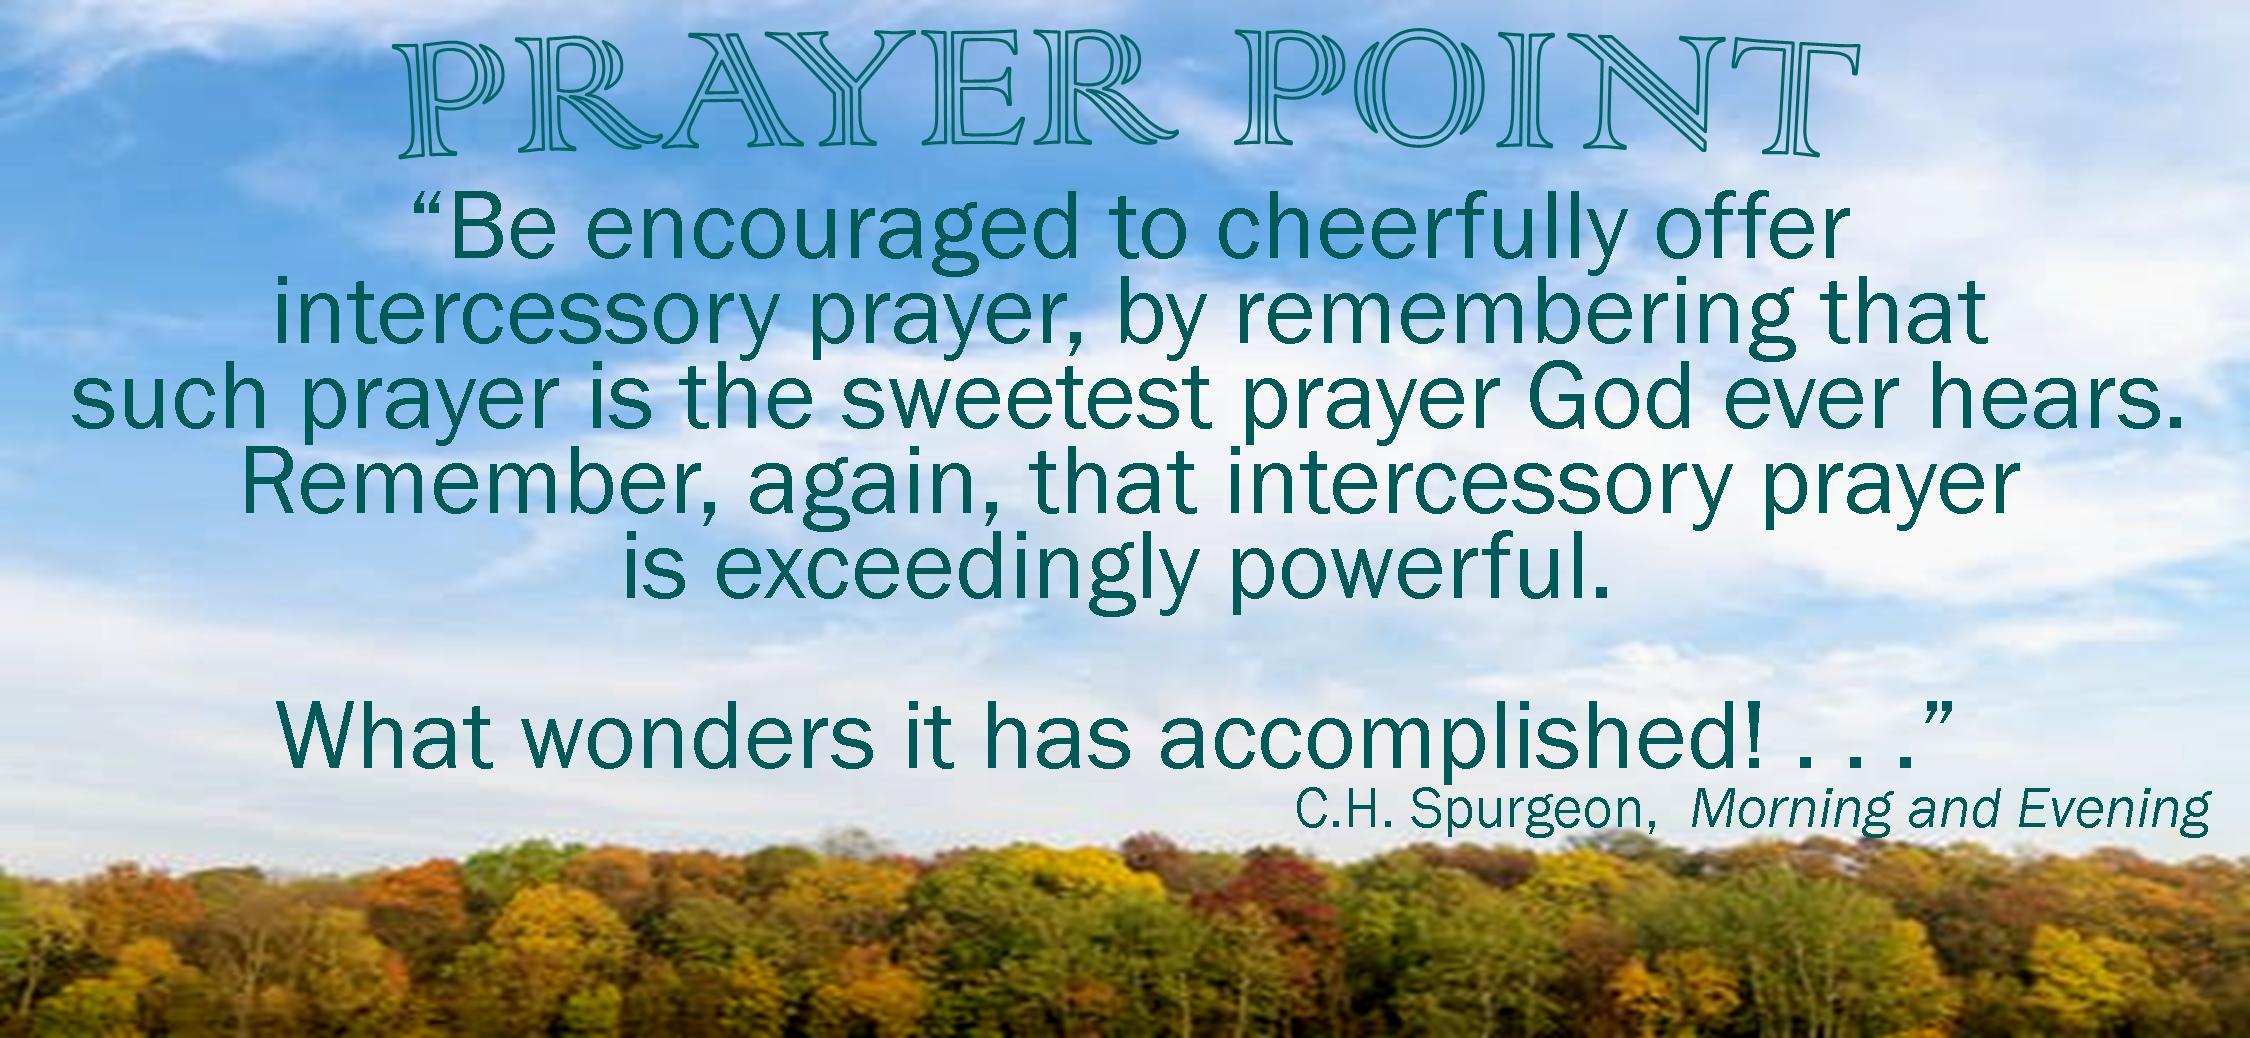 Prayer Point Watercolor Web Page Slider 022818.jpg